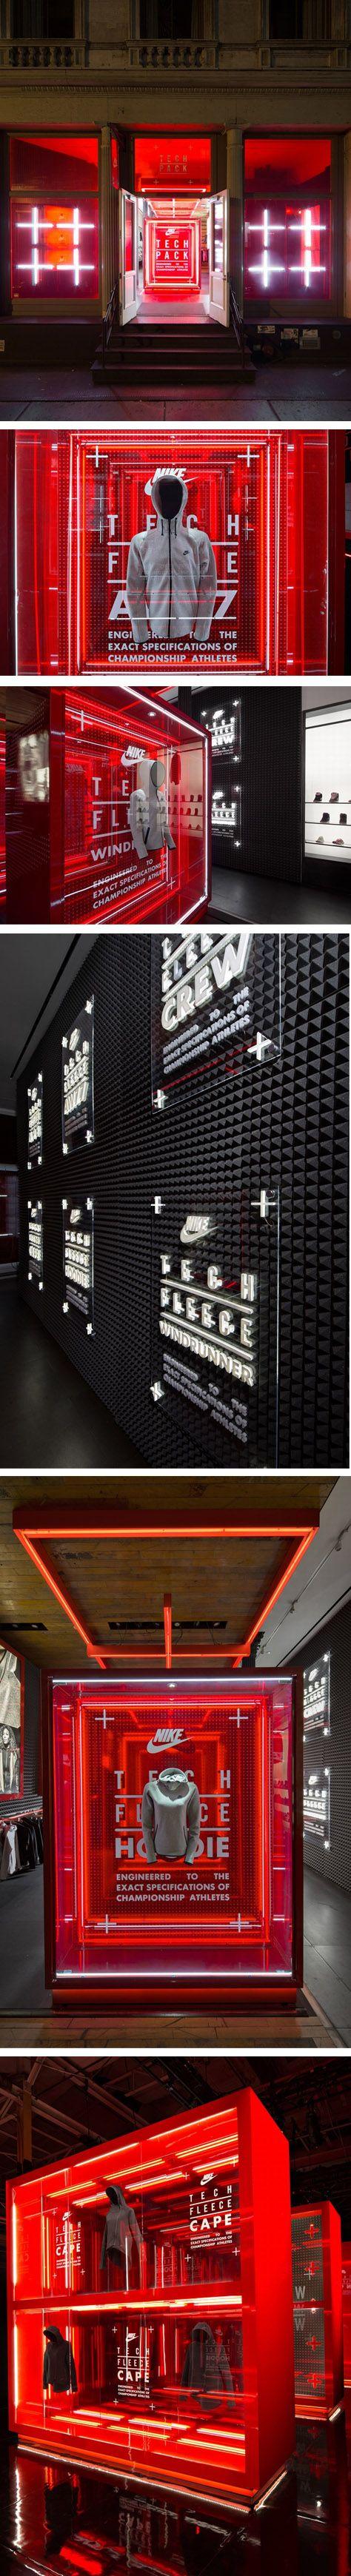 Nike Flagship Store By Nike Weshoulddoitall Corey Yurkovich New York City Retail Design Environmental Design Exhibition Design